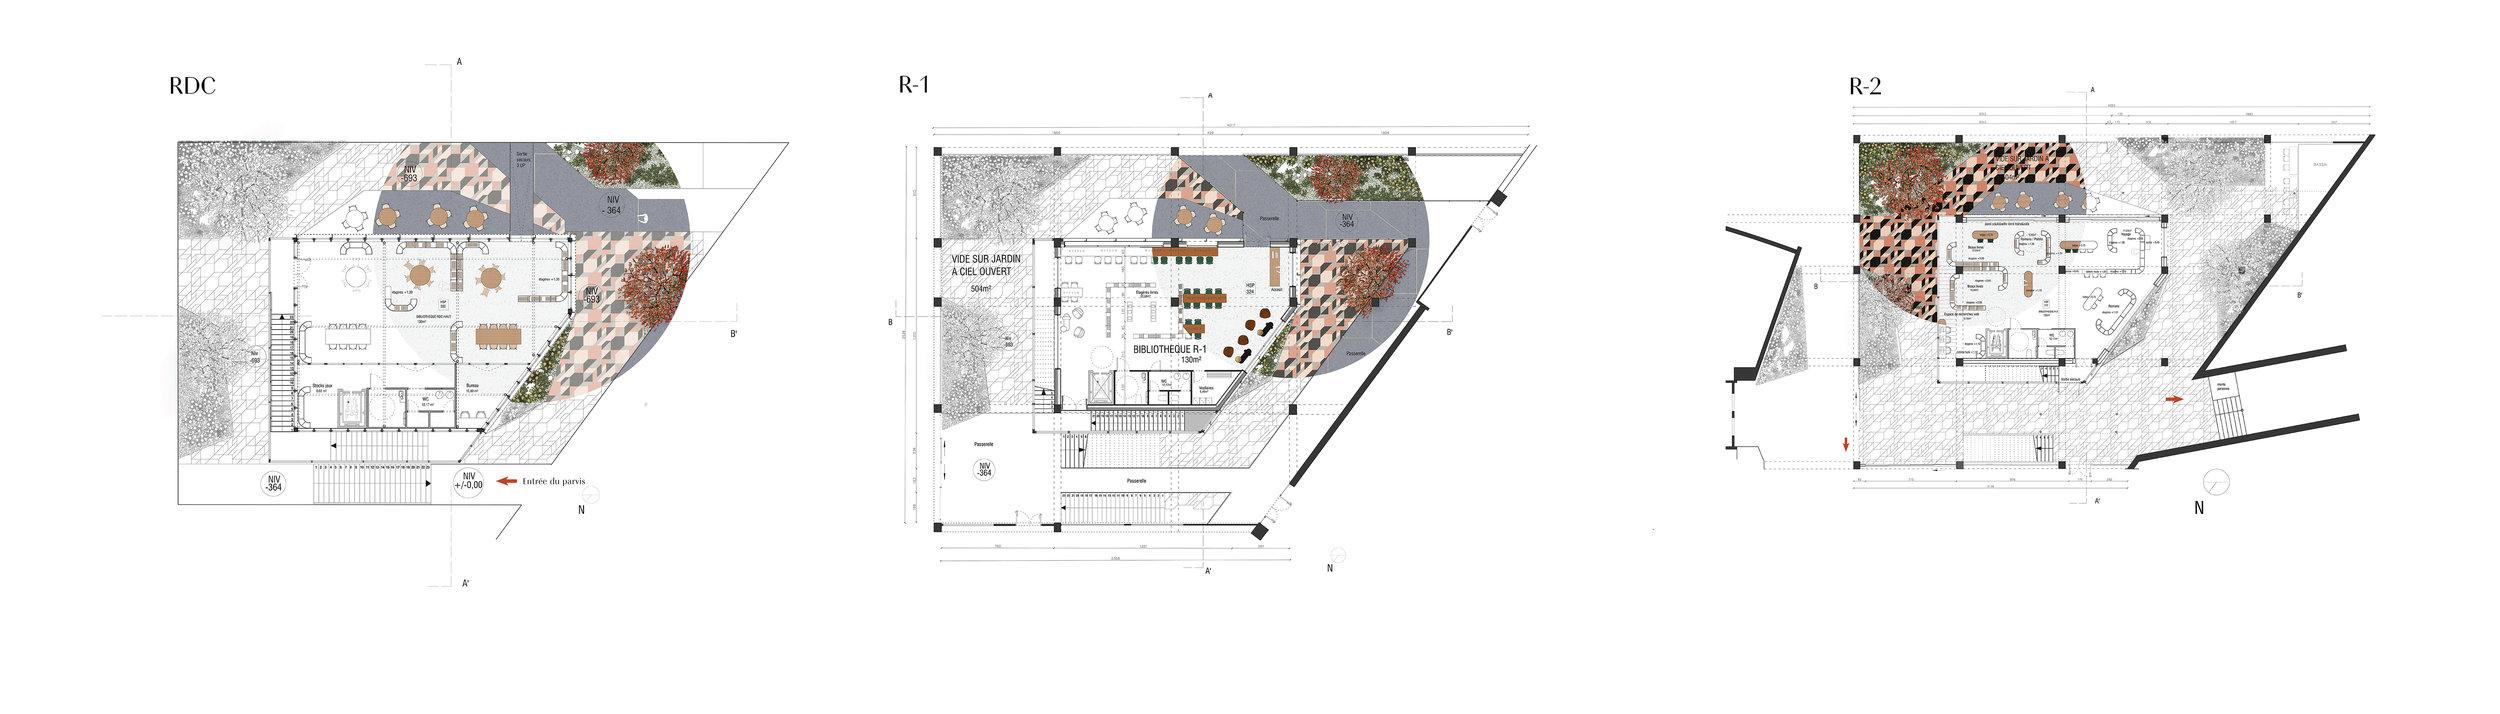 plans concours montparnasse.jpg